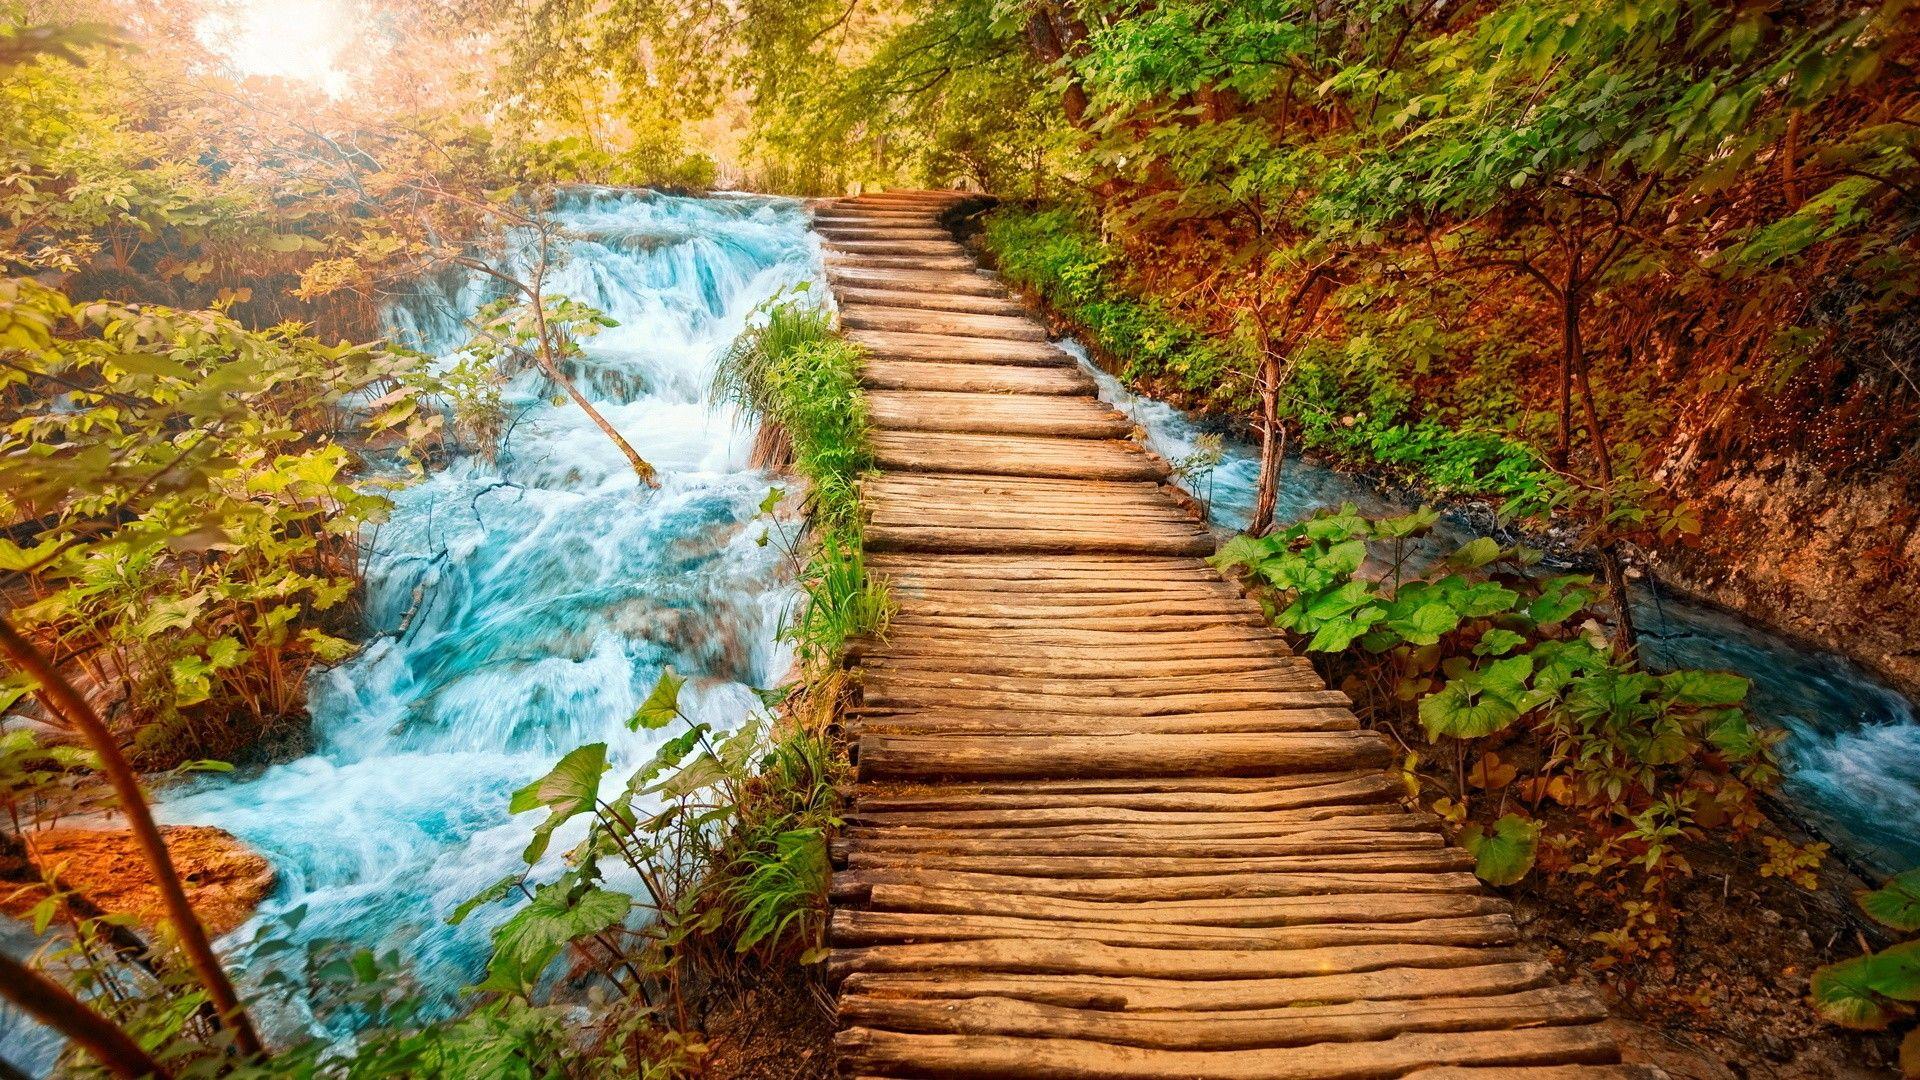 Nature Photo Hd wallpaper background